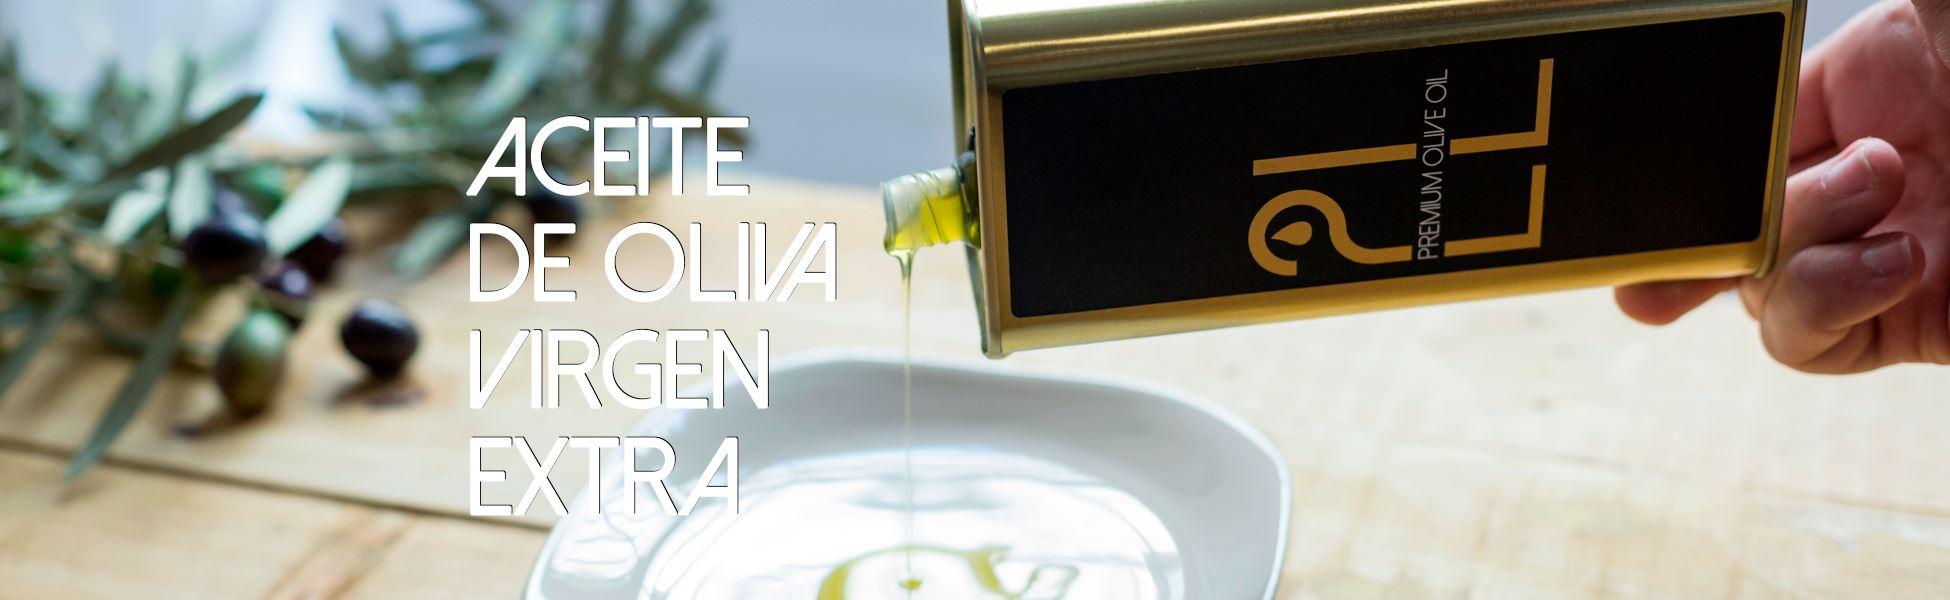 2L Aceite Oliva Virgen Extra Fondo • AtracoM Comercio Cashback